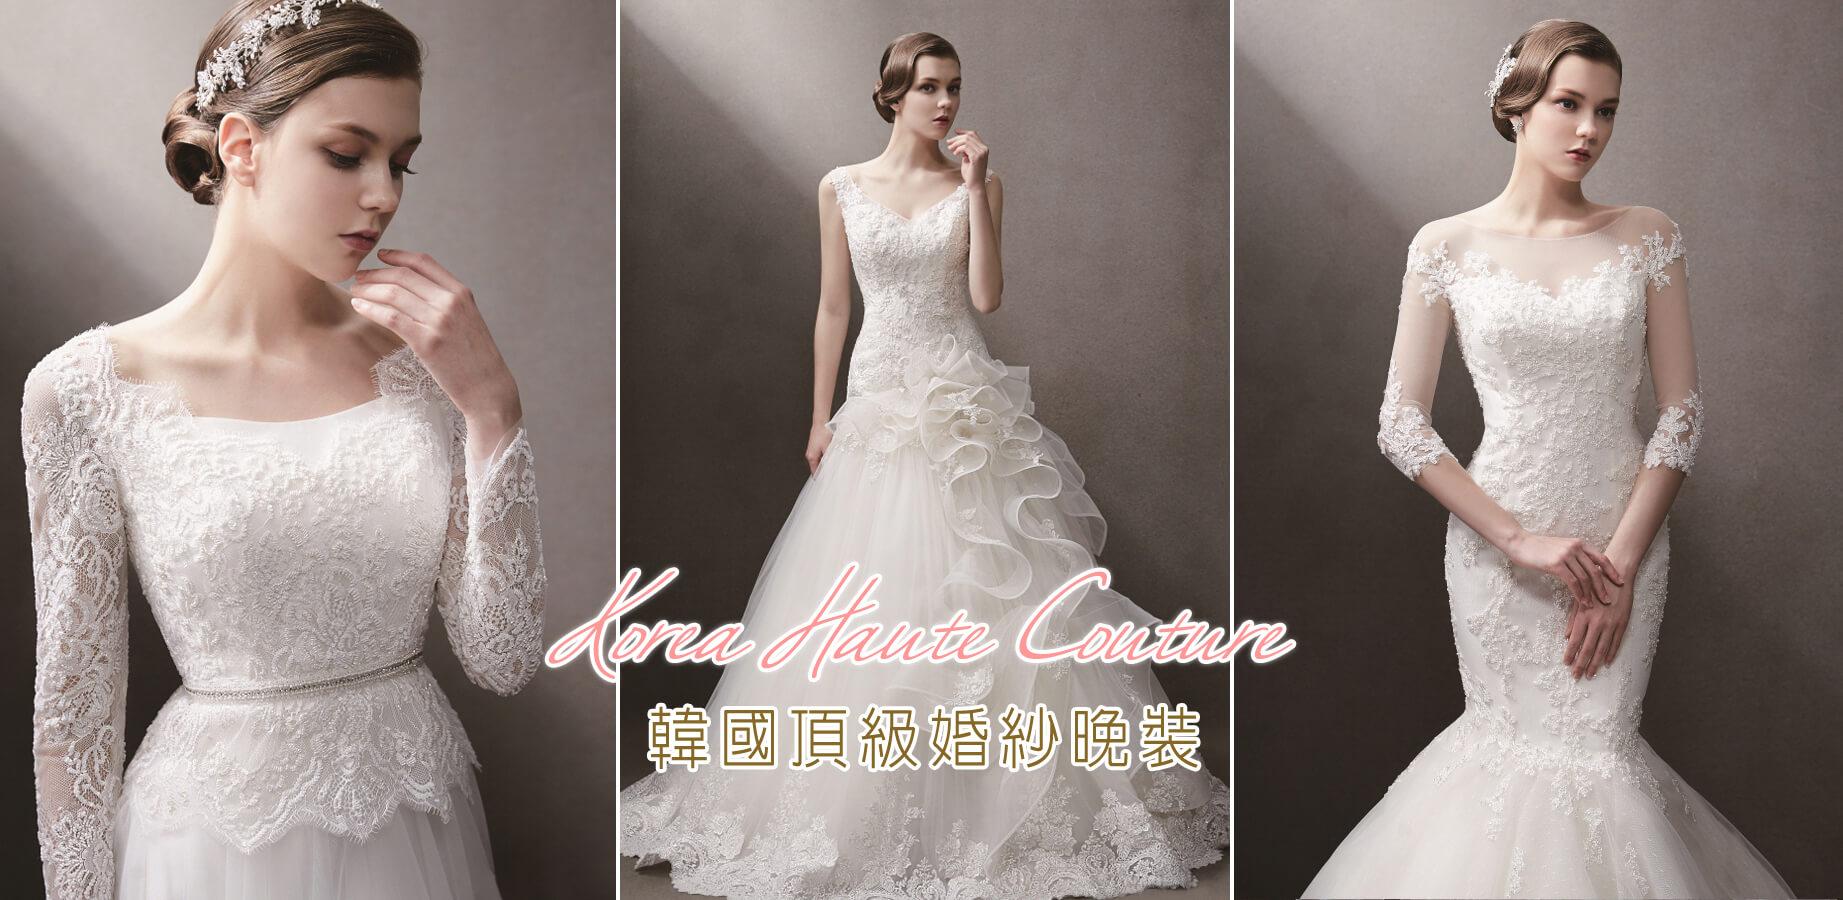 korea-haute-couture